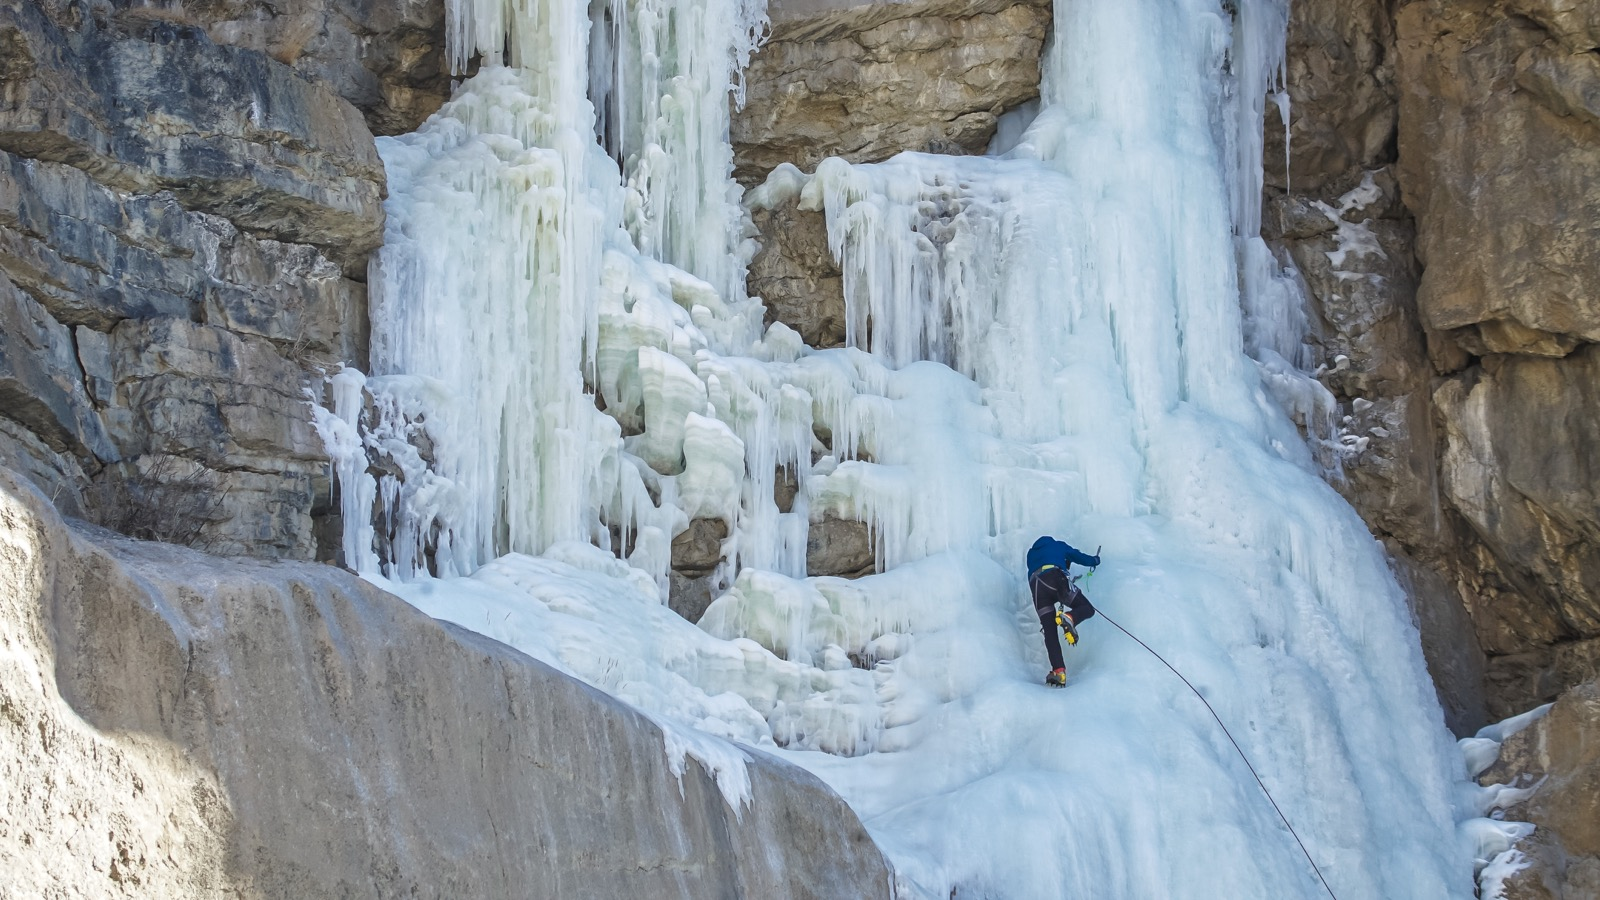 Still from The Fall. Pranav Rawat leading on the second pitch. Shela waterfall (260 ft, WI4). Near Kaza town, Spiti, Himachal Pradesh. Jan 2016. Photo © Abhijeet Singh